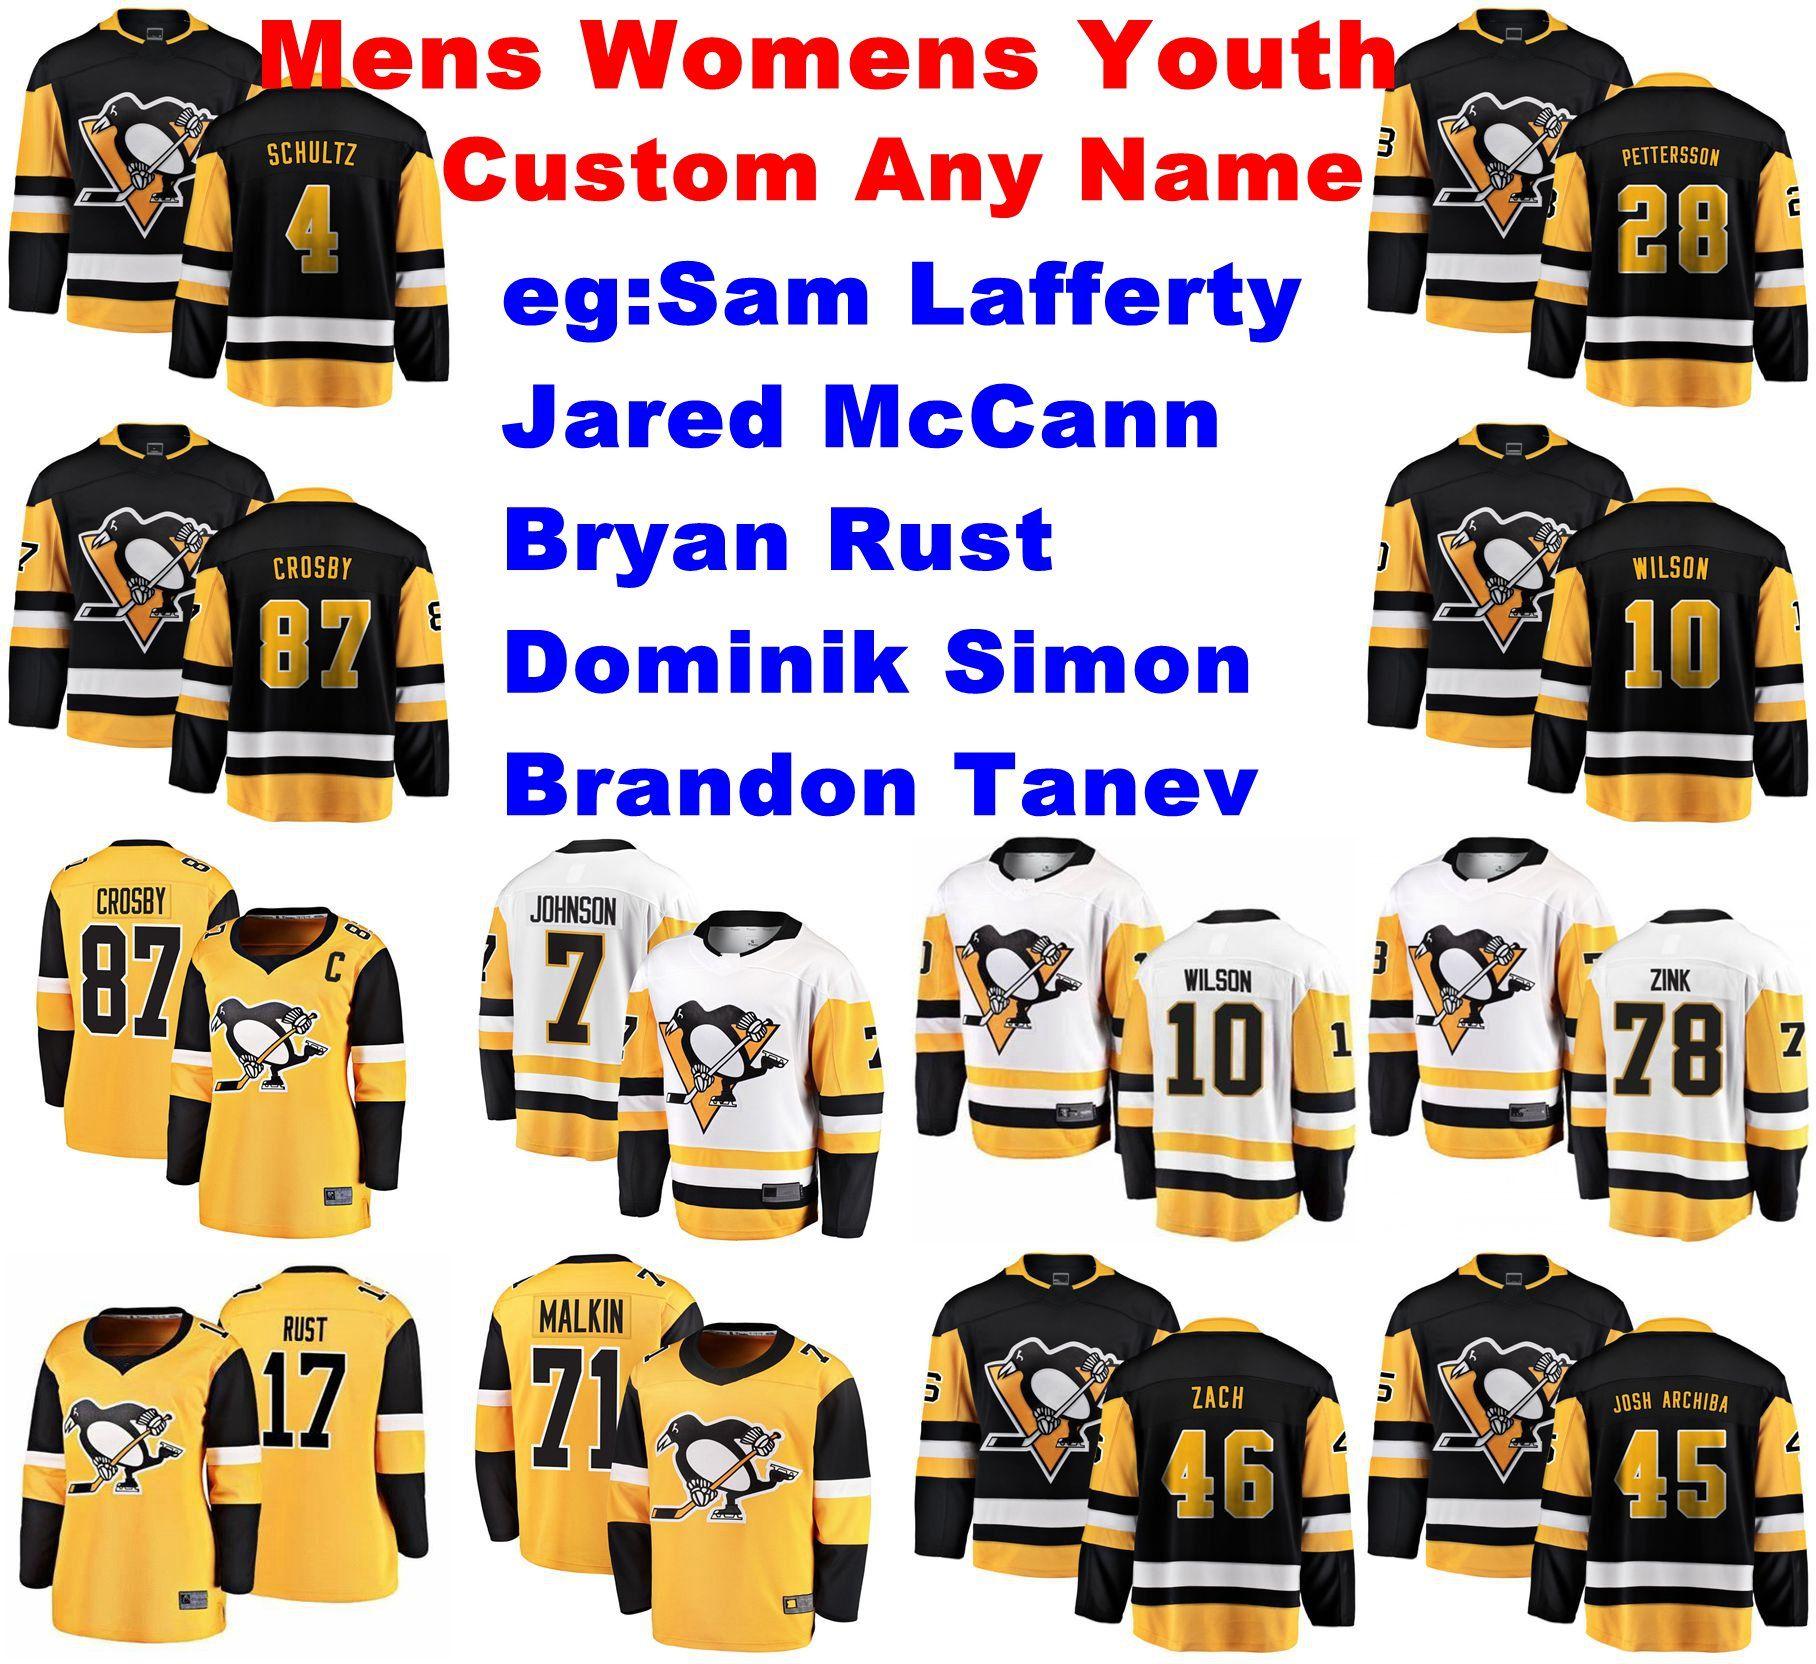 Pittsburgh Penguins Jerseys Womens Sam Lafferty Jersey Brandon Tanev Dominik Simon Rust McCann Ice Hockey Jerseys Personalizar costurado